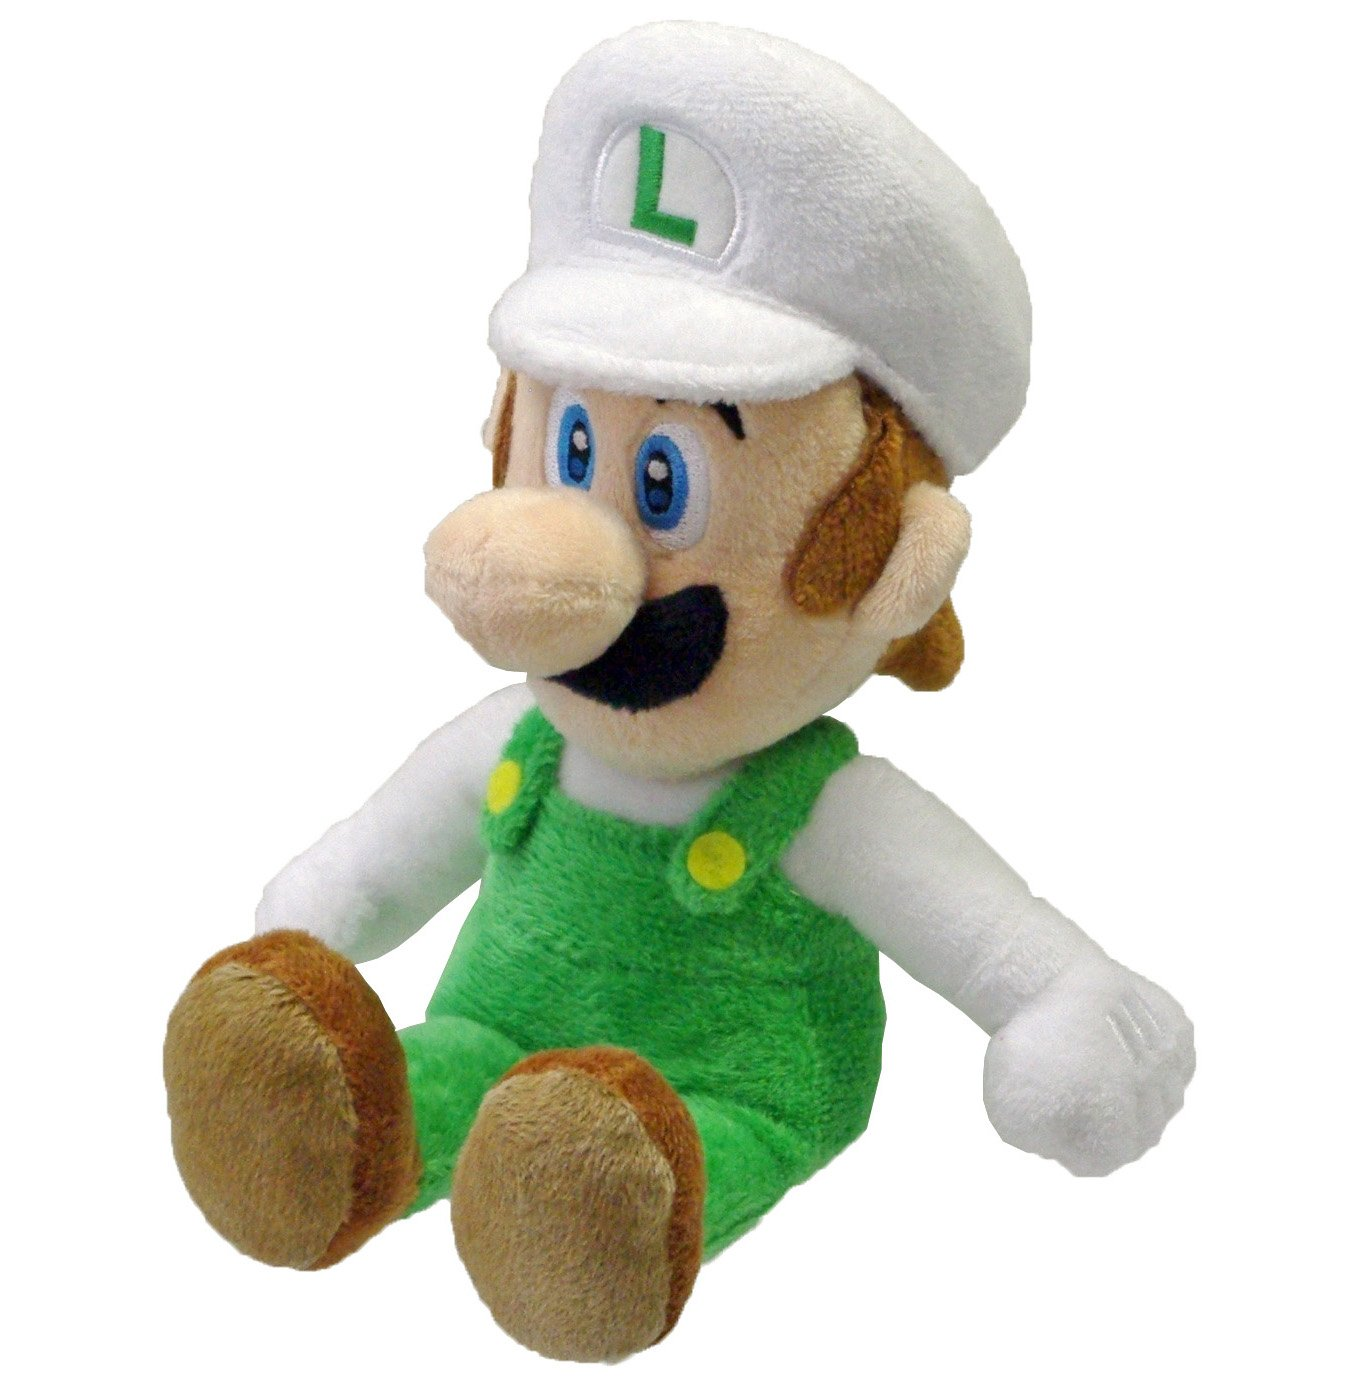 Fire Luigi Official Super Mario Plush (1)